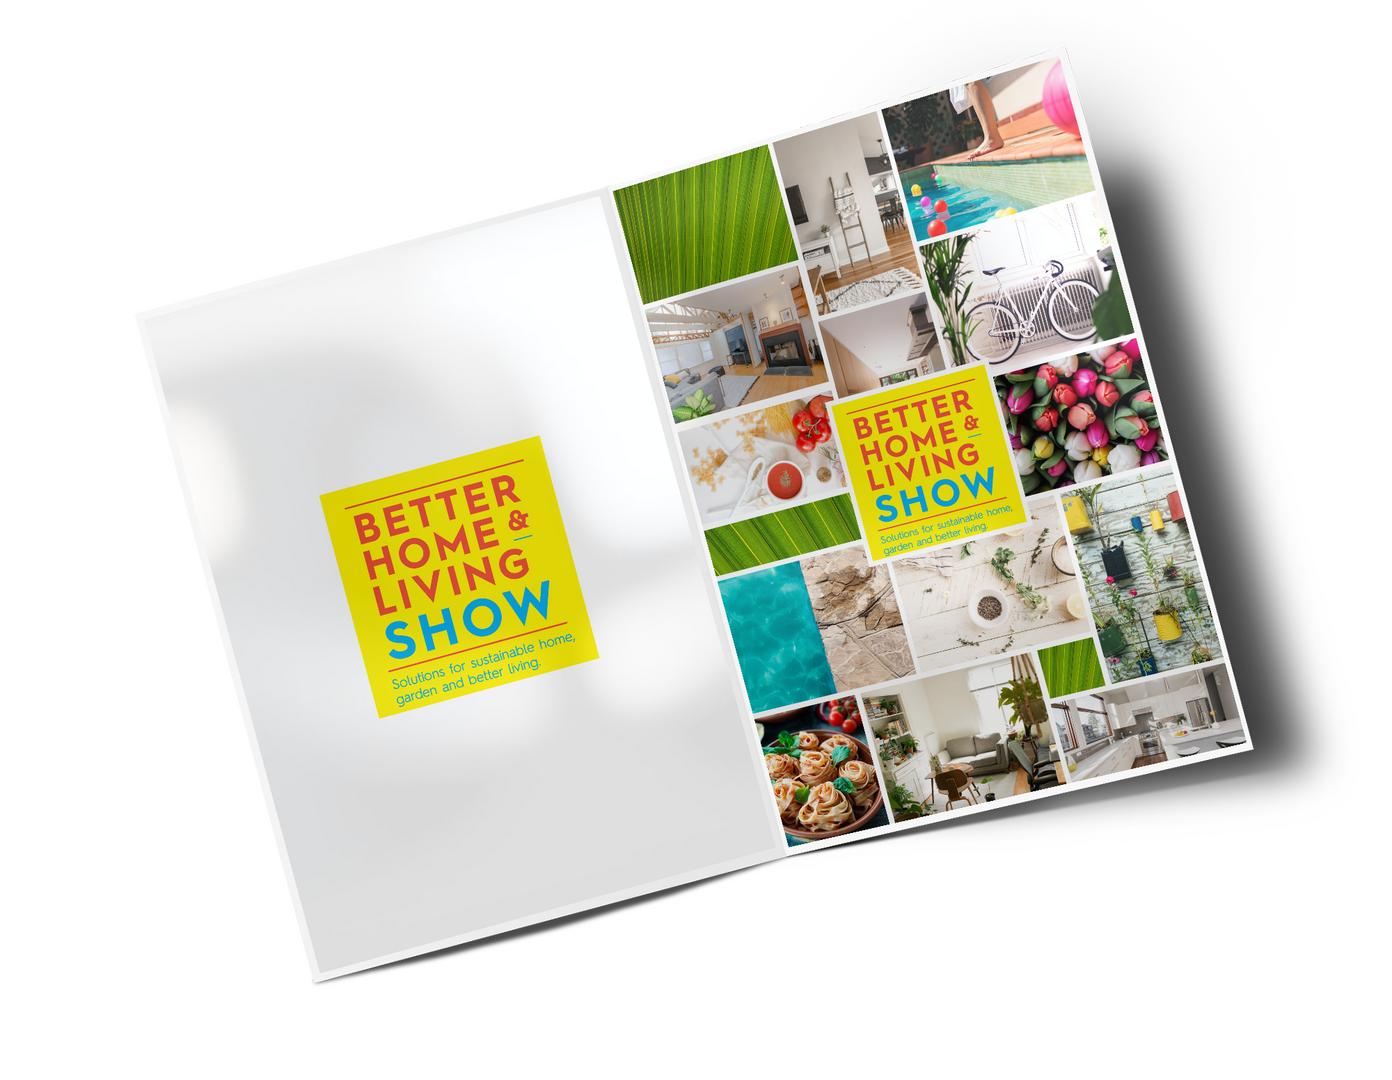 Better Home & Living Show